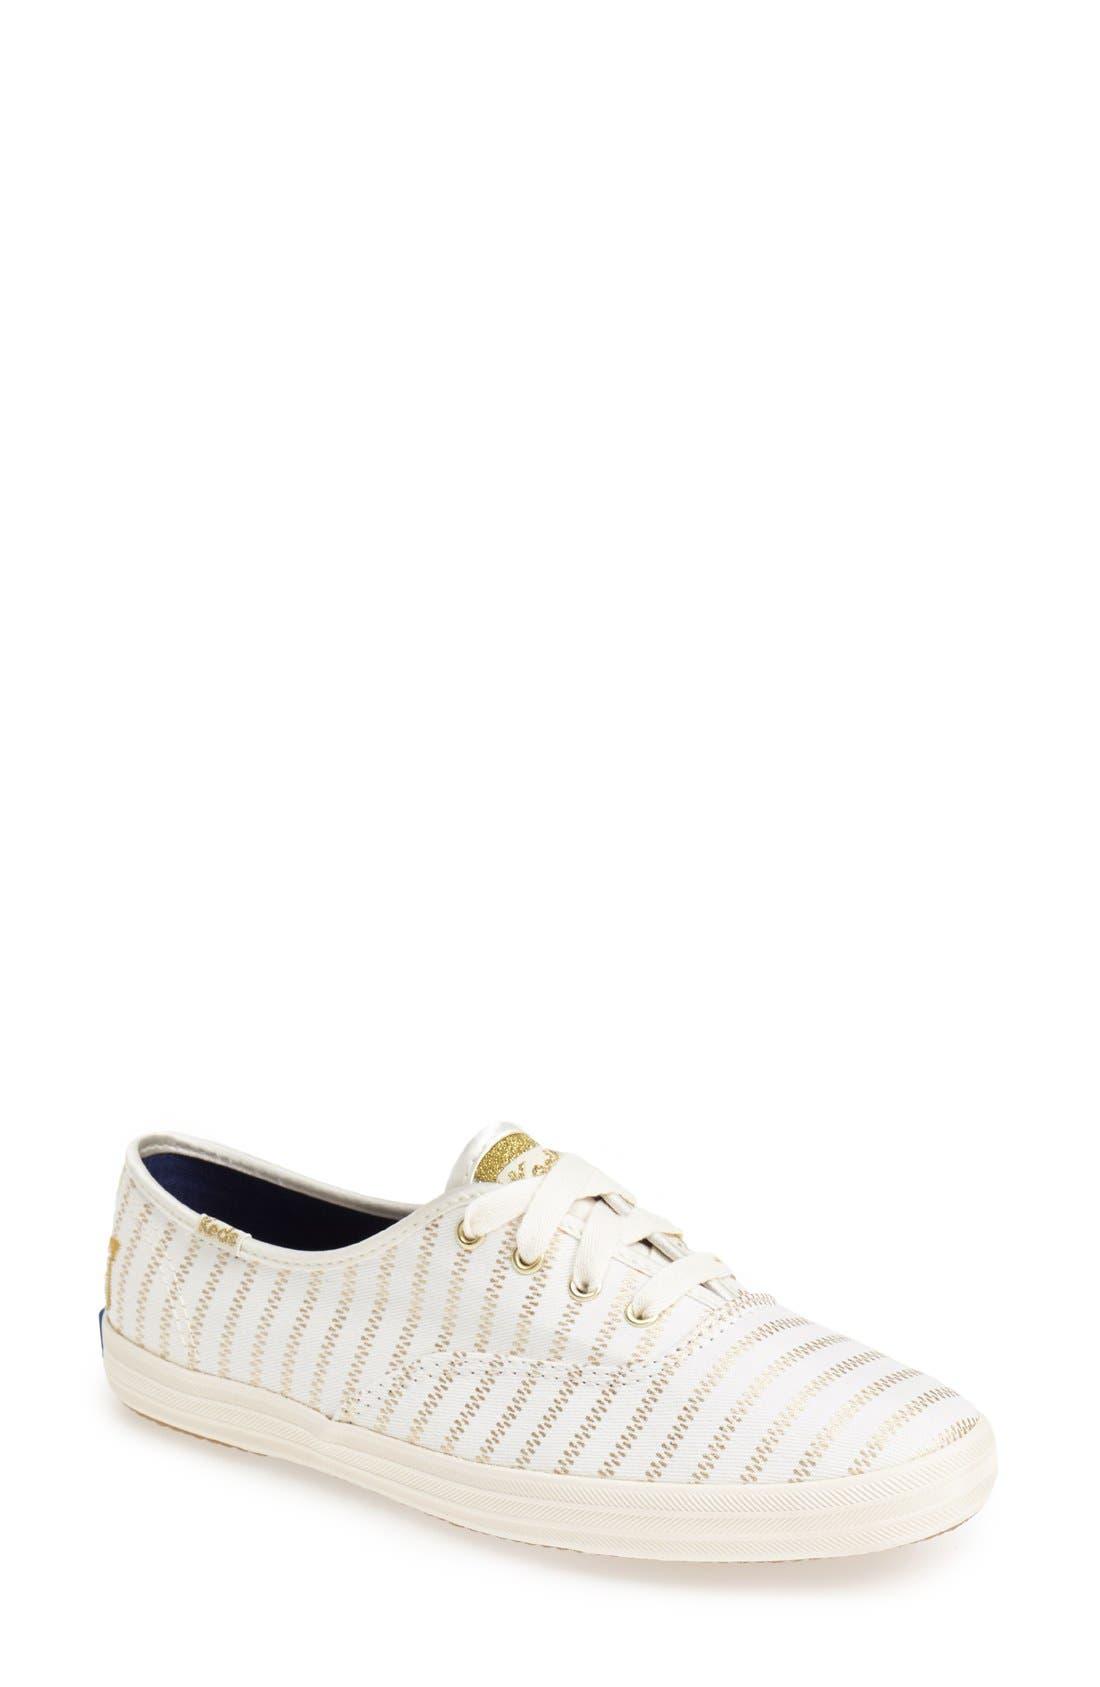 Main Image - Keds® 'Champion - Zip Zipper' Sneaker (Women)